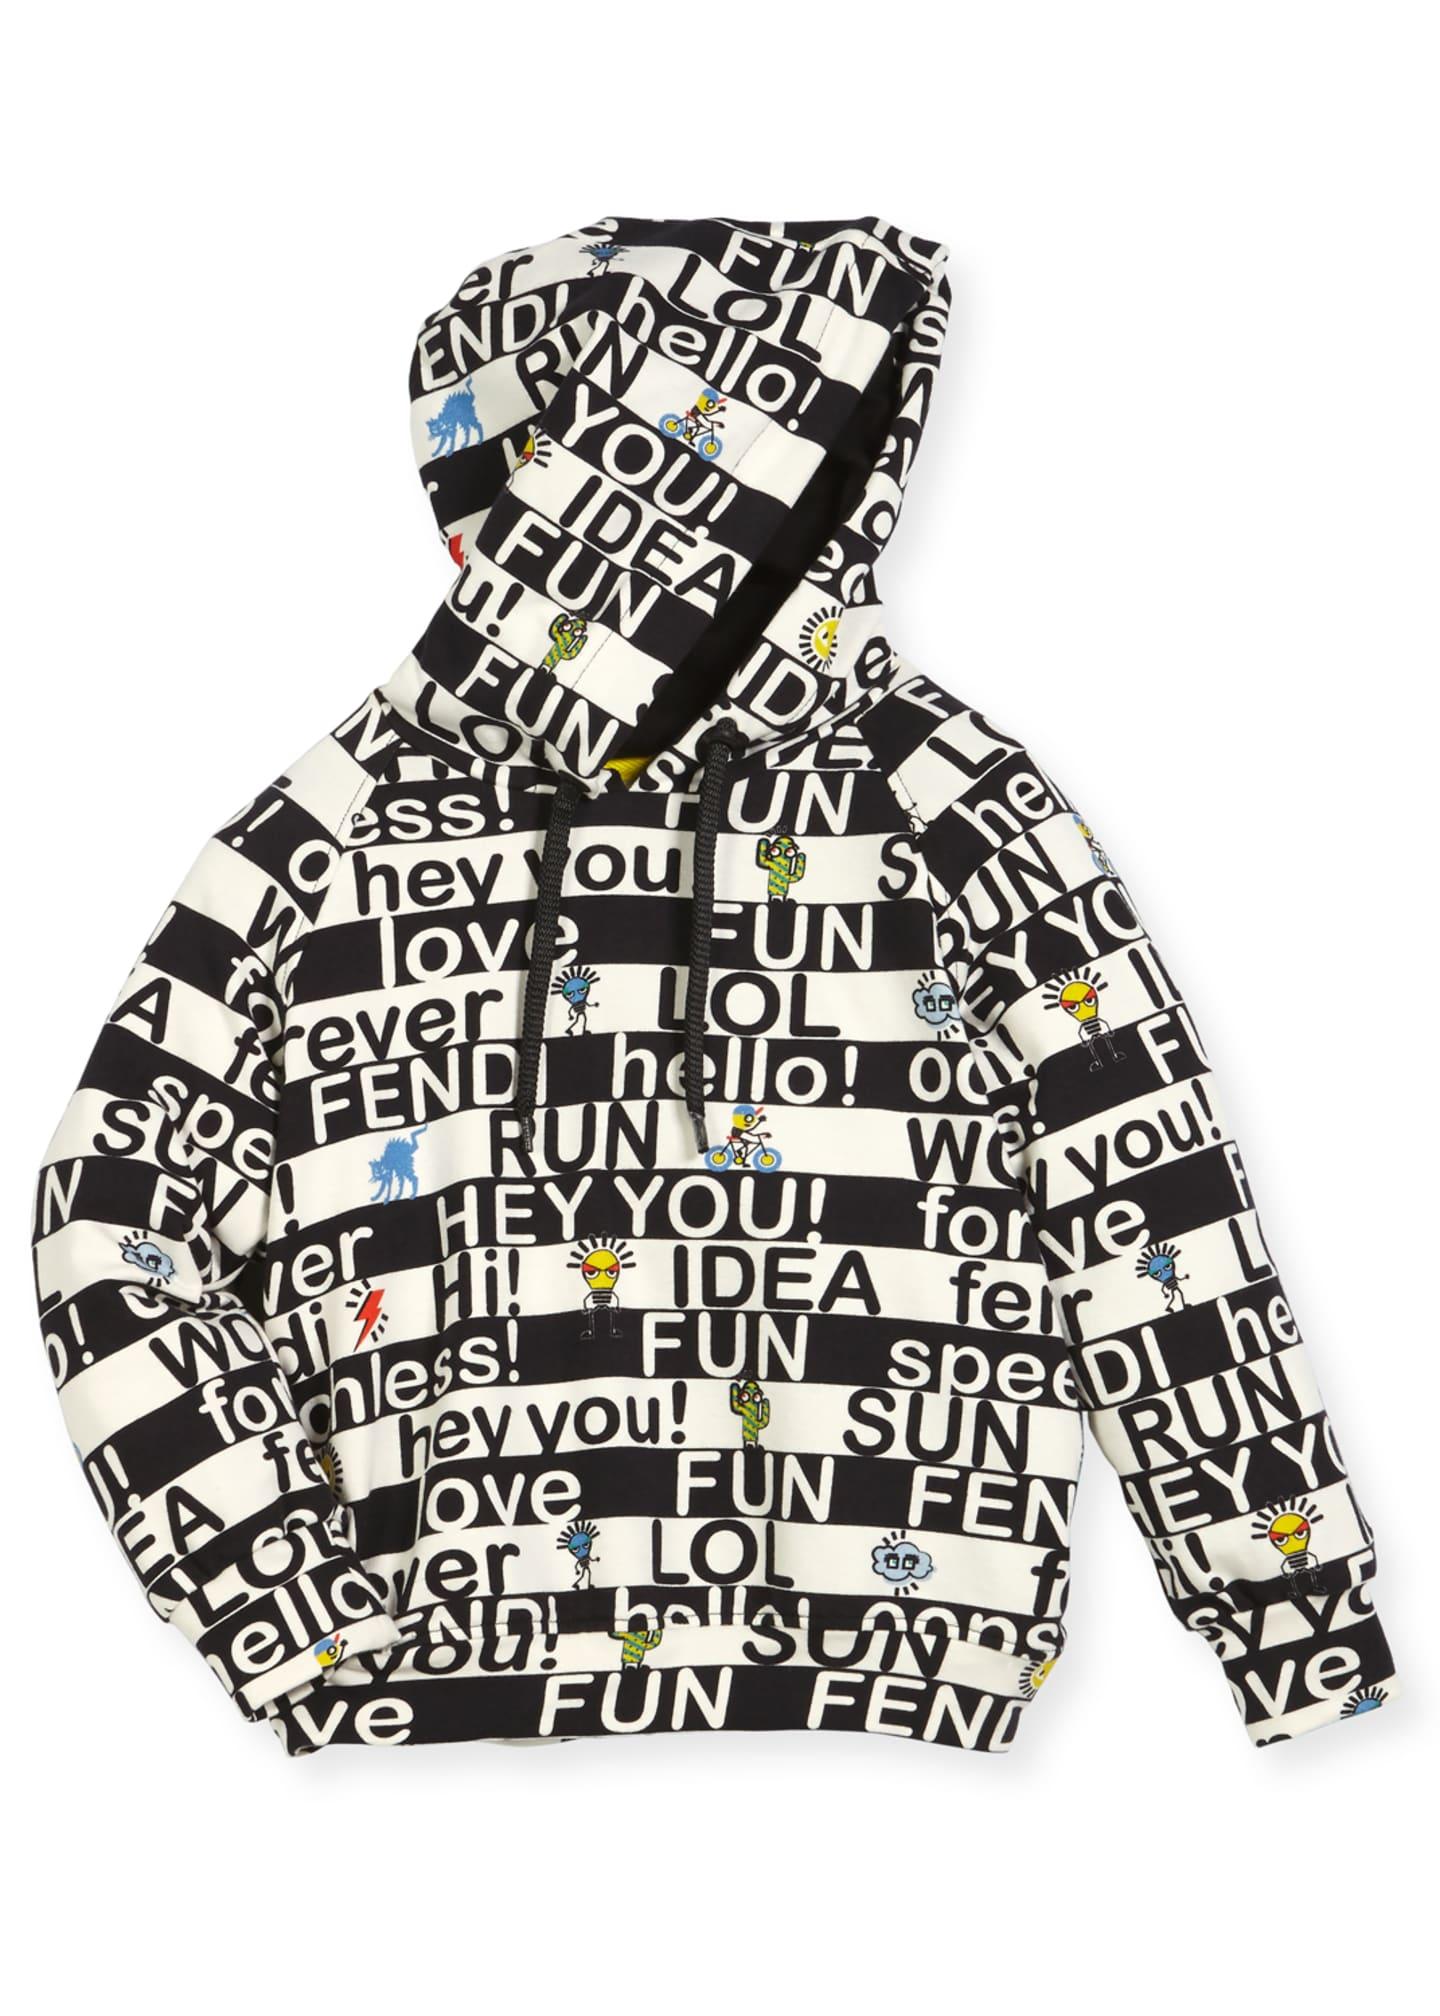 Fendi Boys' Allover Words Graphic Hooded Sweatshirt, Size